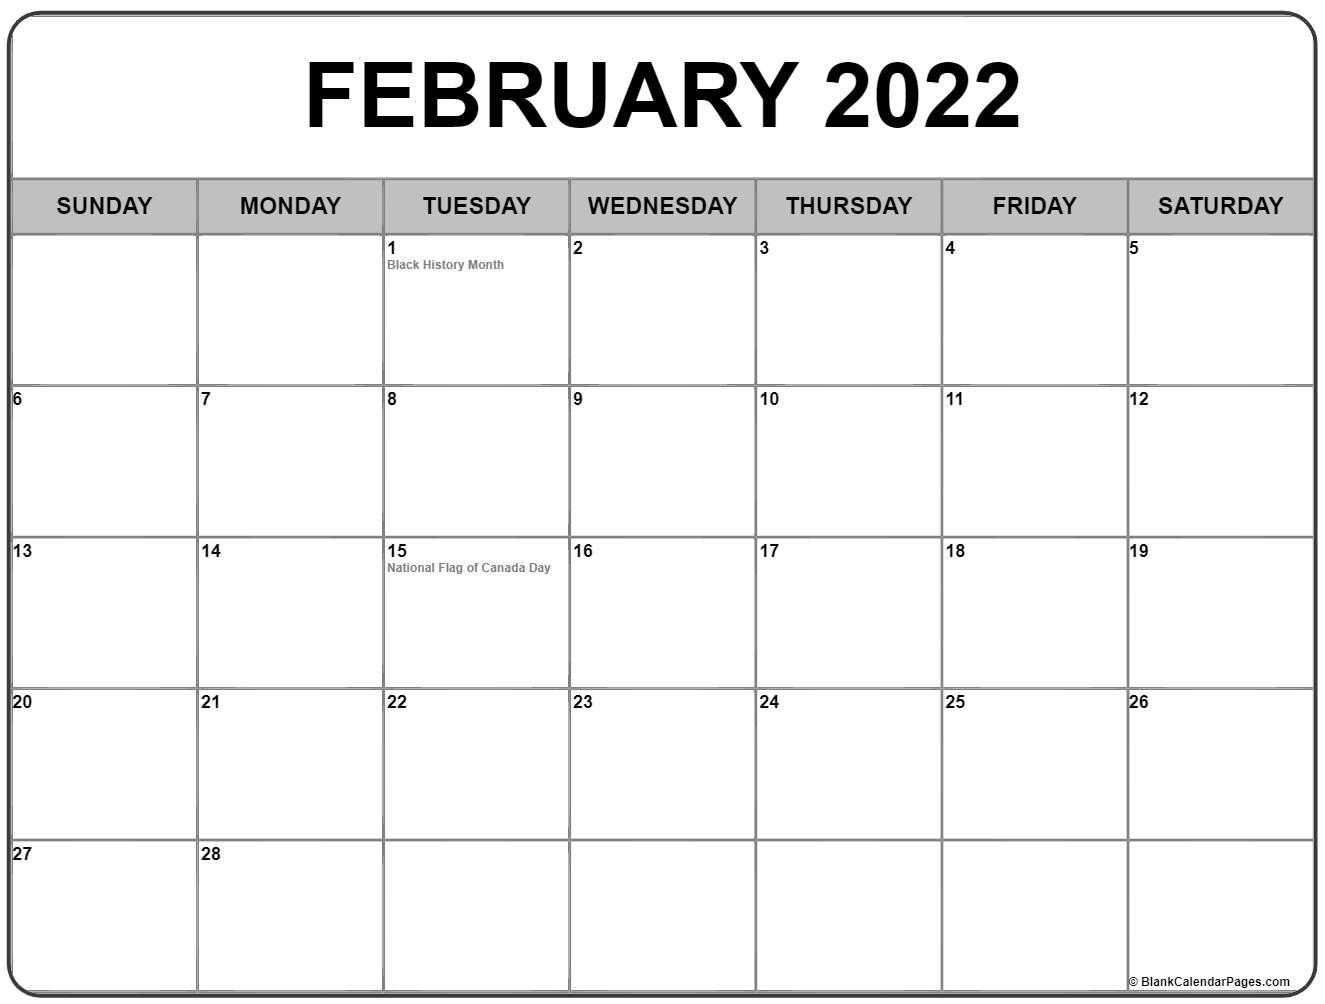 February 2022 Calendar With Holidays Within Blank Calendar For February 2022